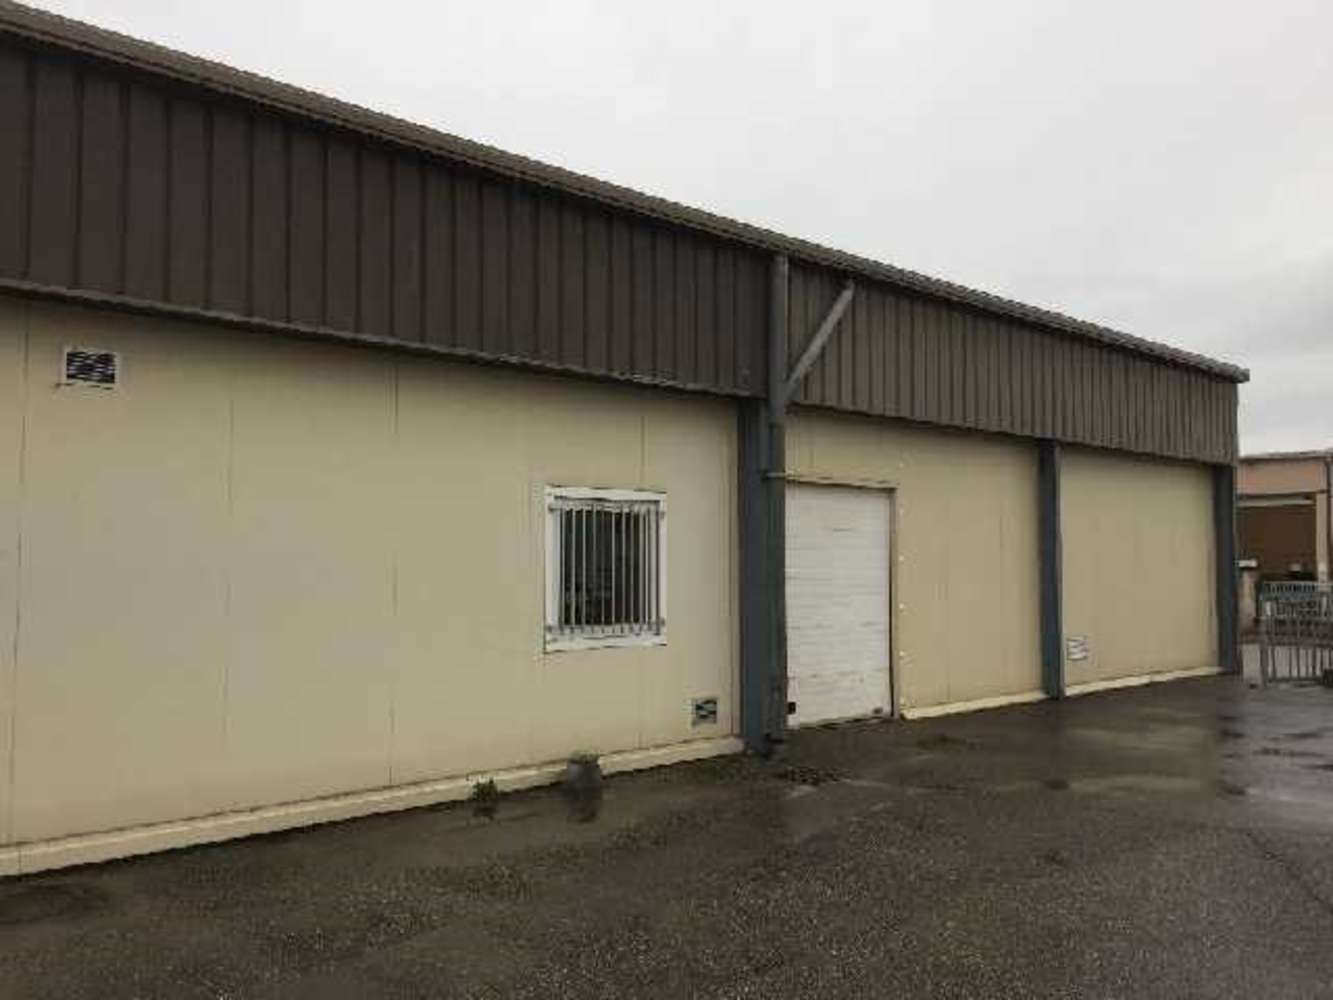 Activités/entrepôt Corbas, 69960 - Location entrepot Corbas - Type Froid - 9802491